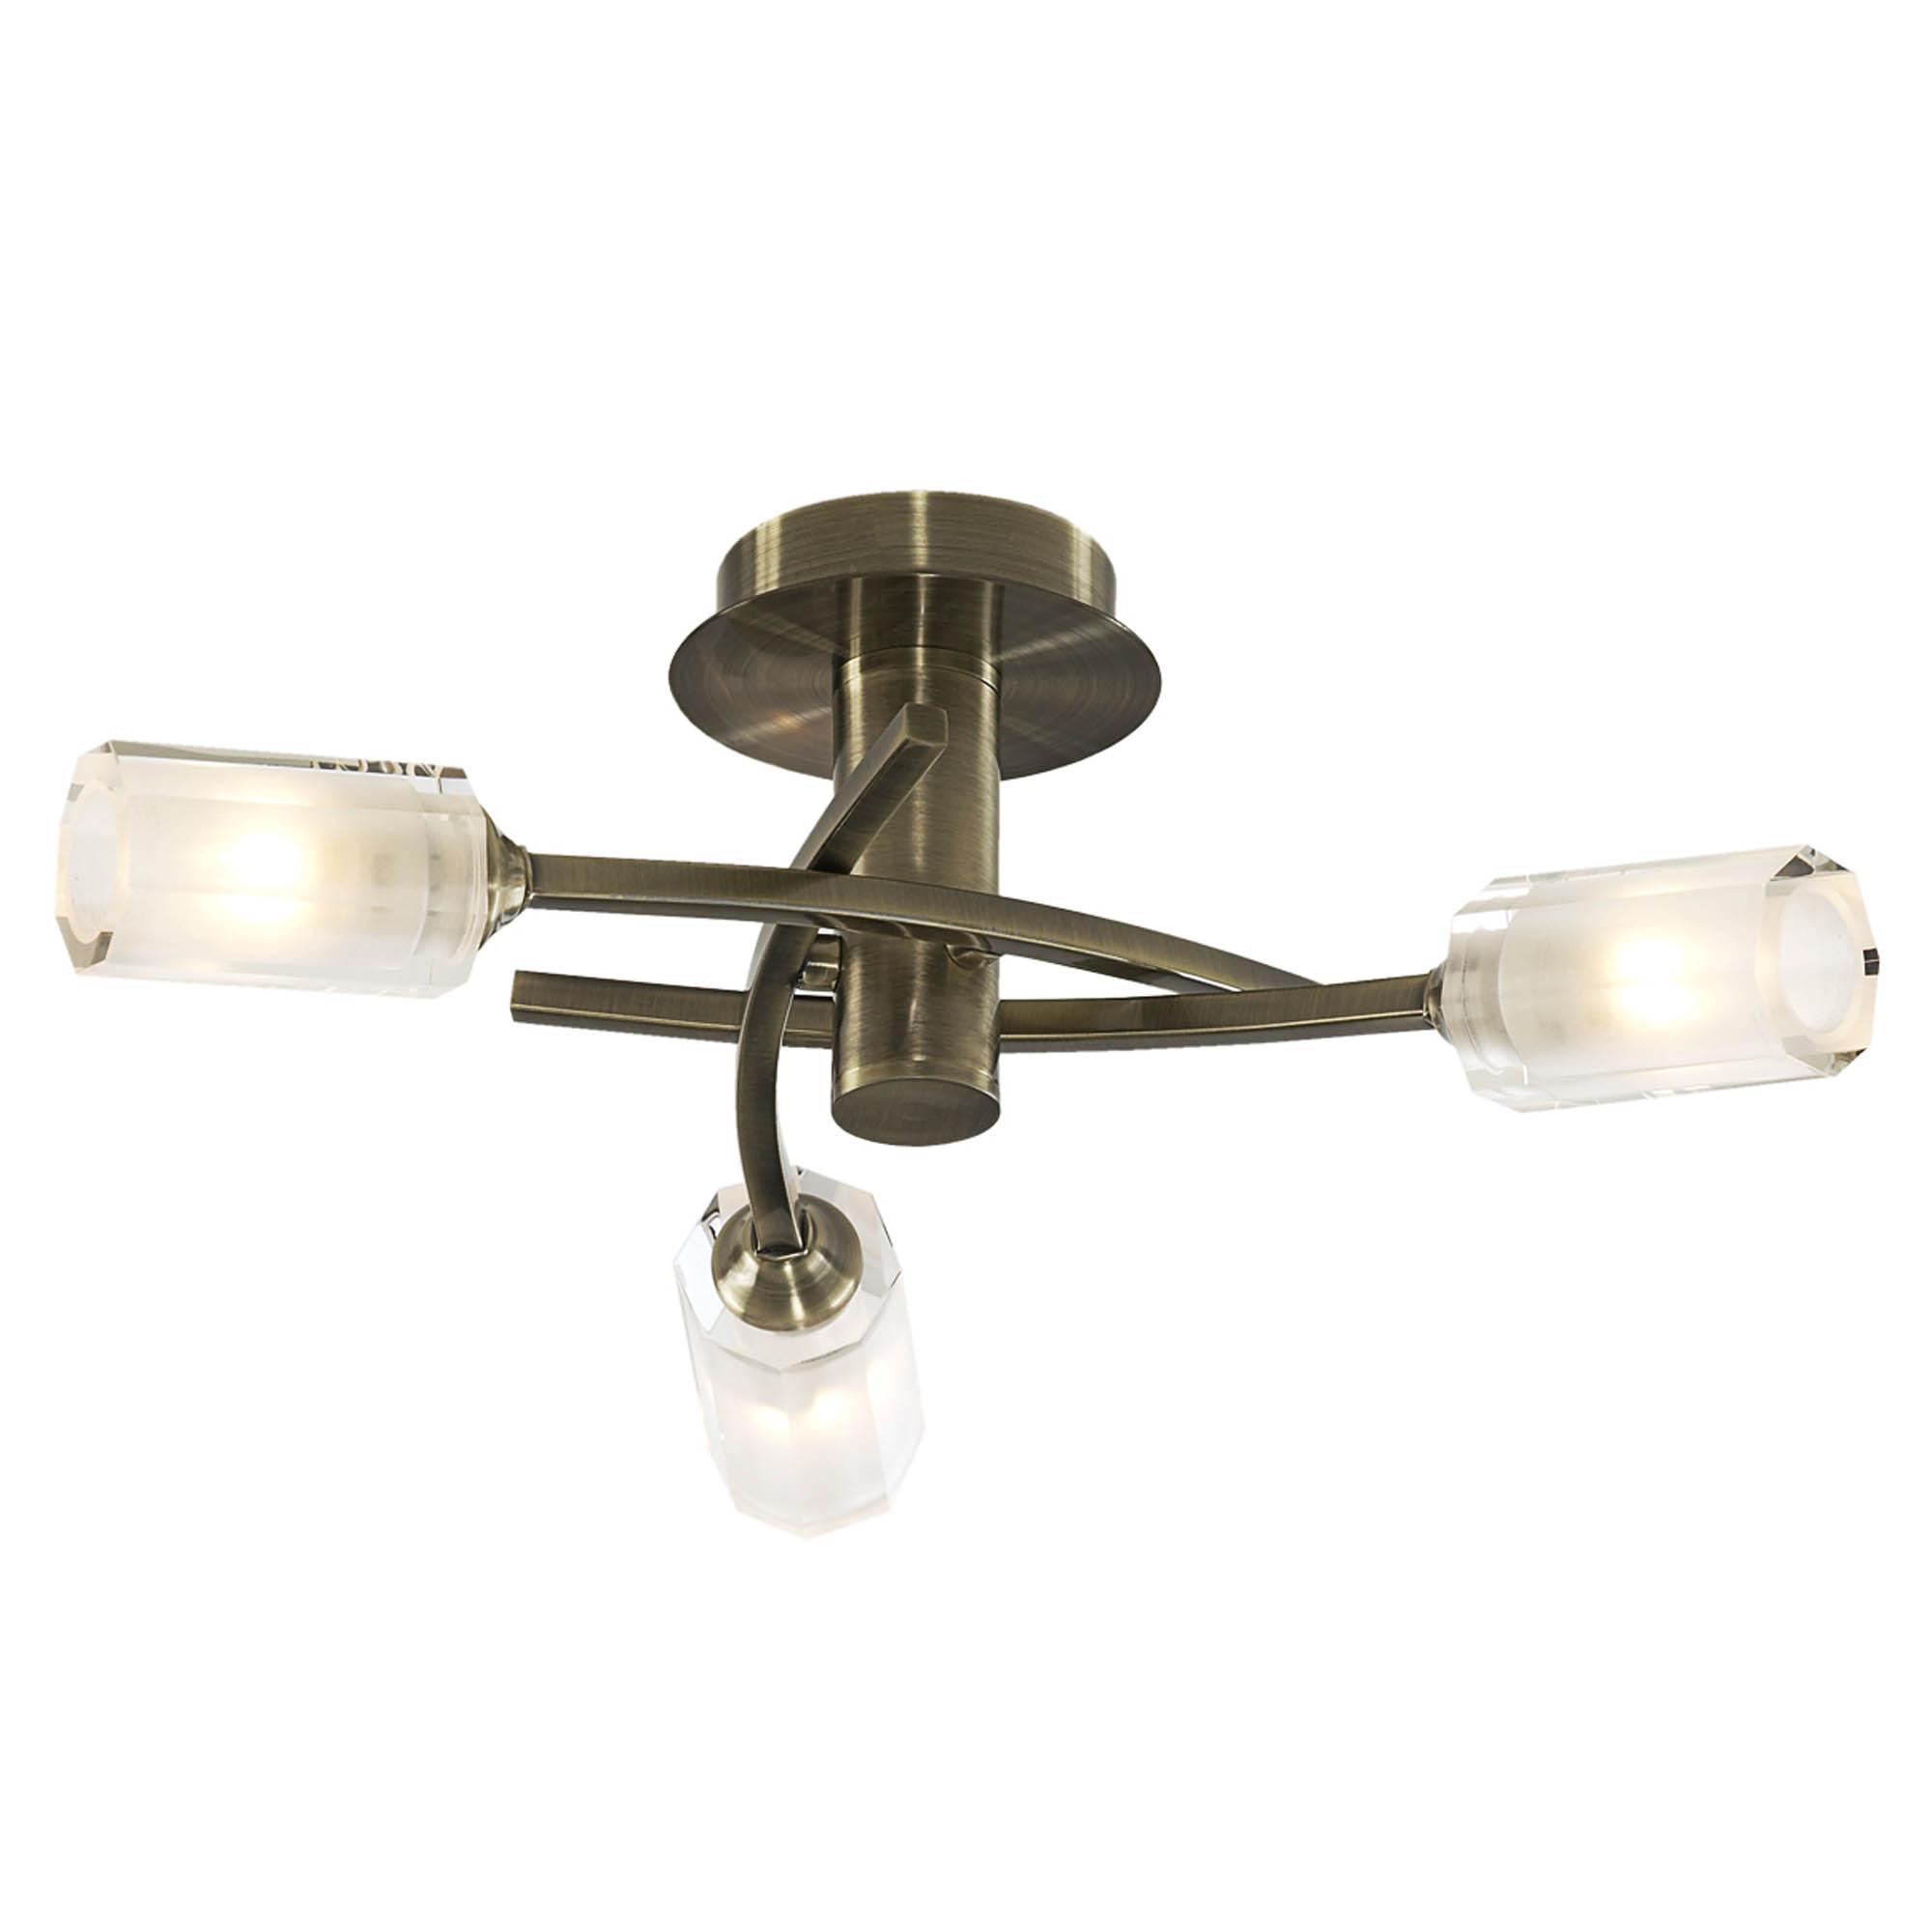 John Lewis Ceiling Lights Antique Brass : Ceiling light fitting antique brass